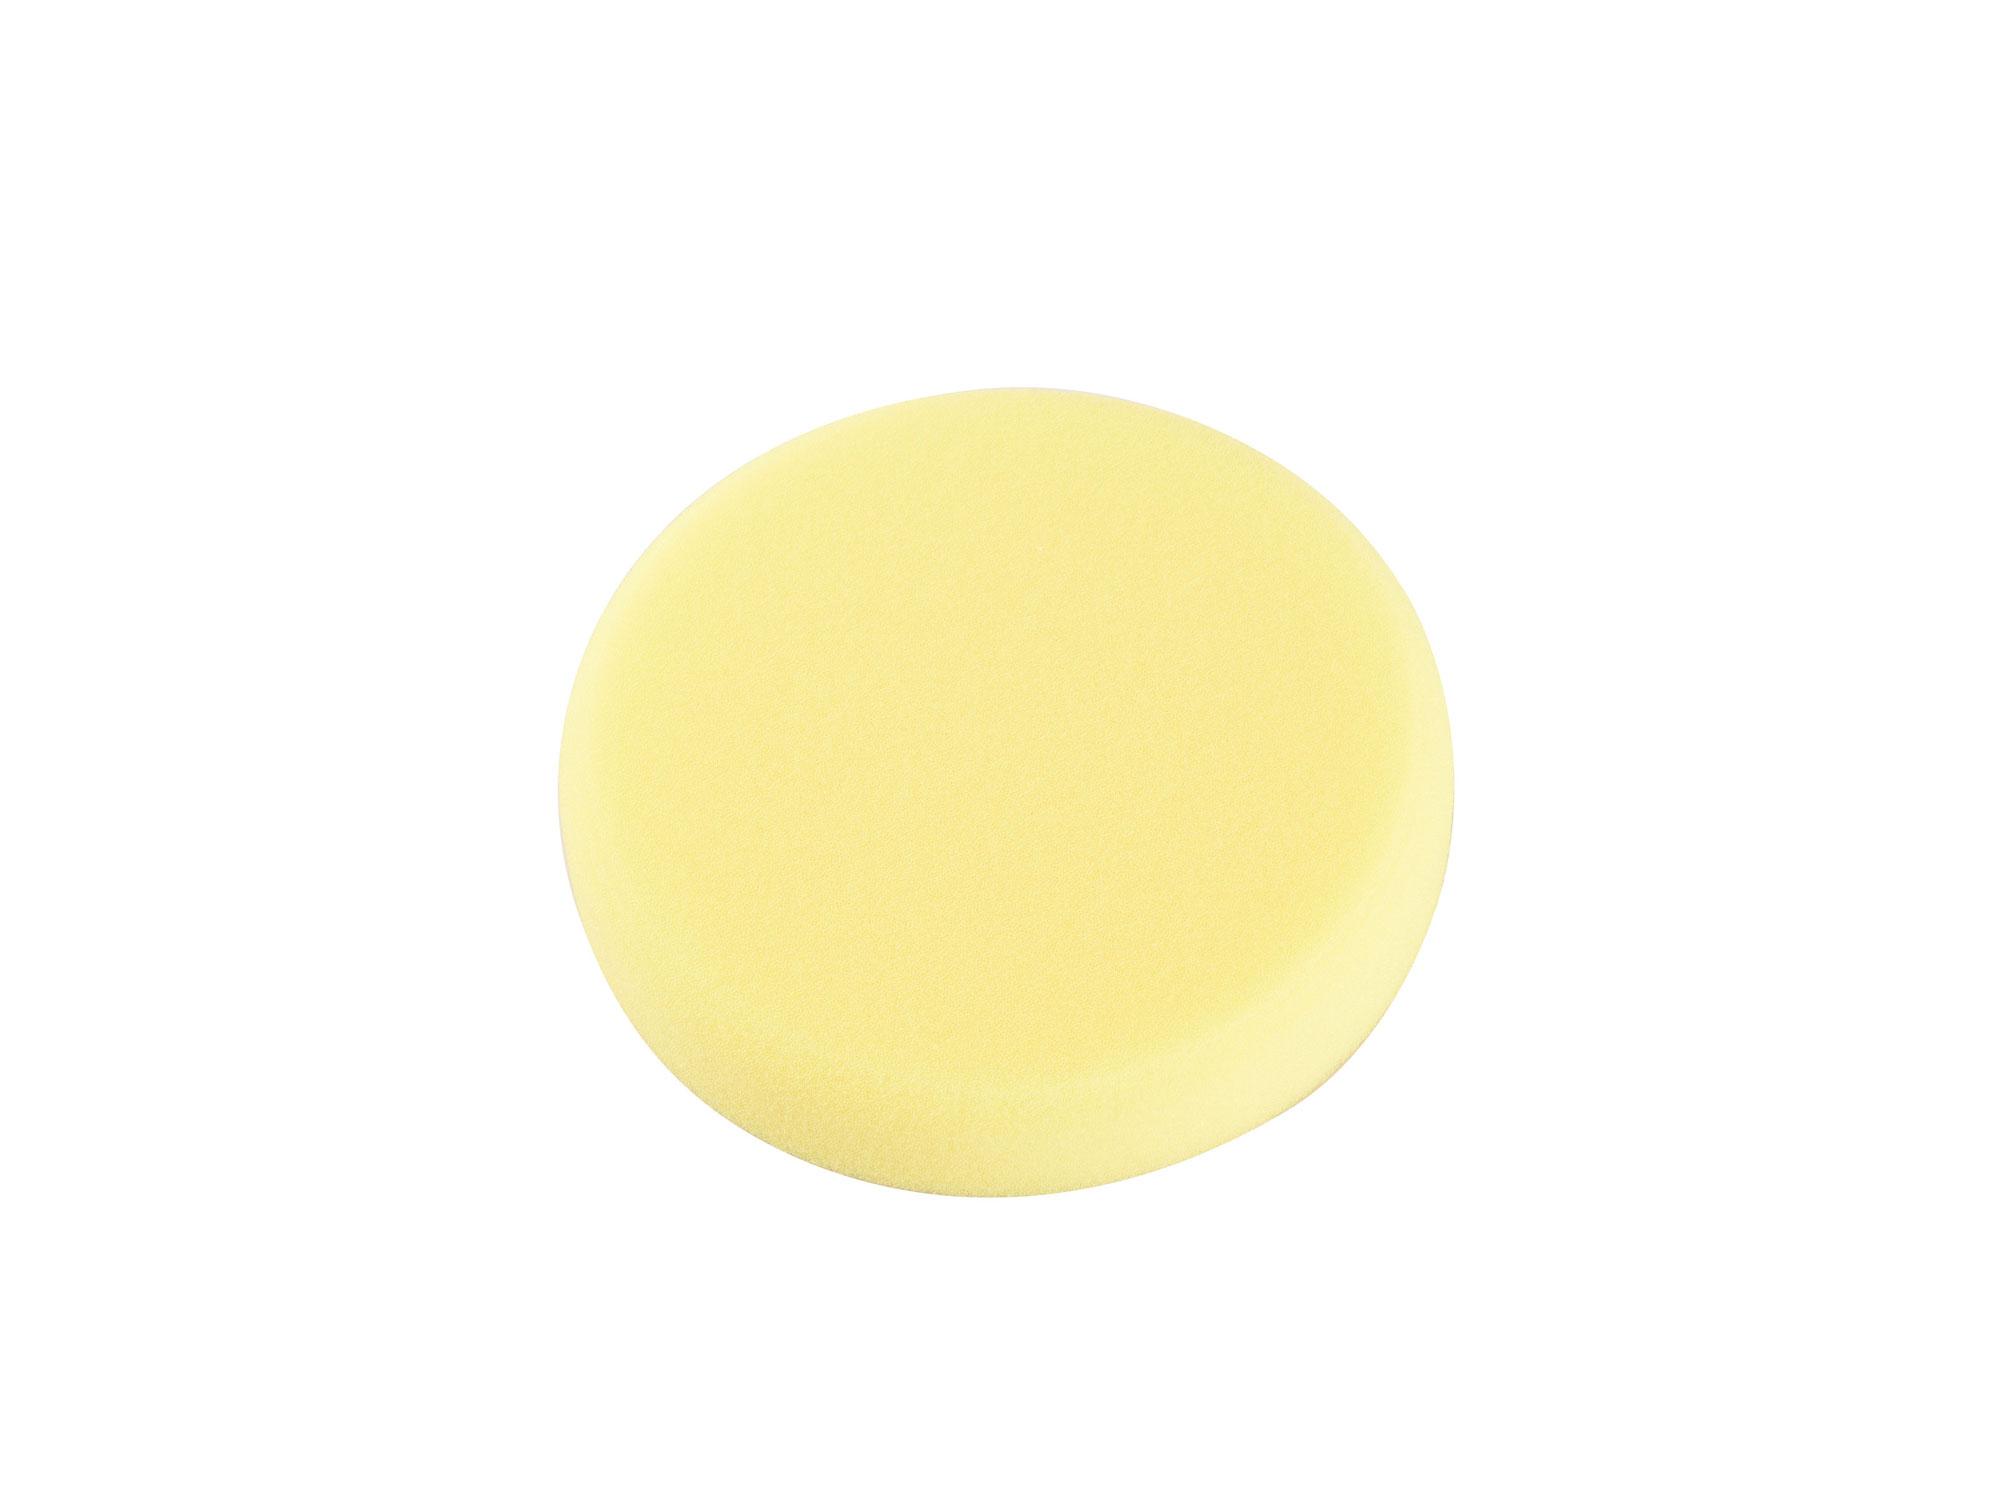 Kotouč leštící penový, T80, žlutý, R150x30mm, suchý zip EXTOL PREMIUM 8803548